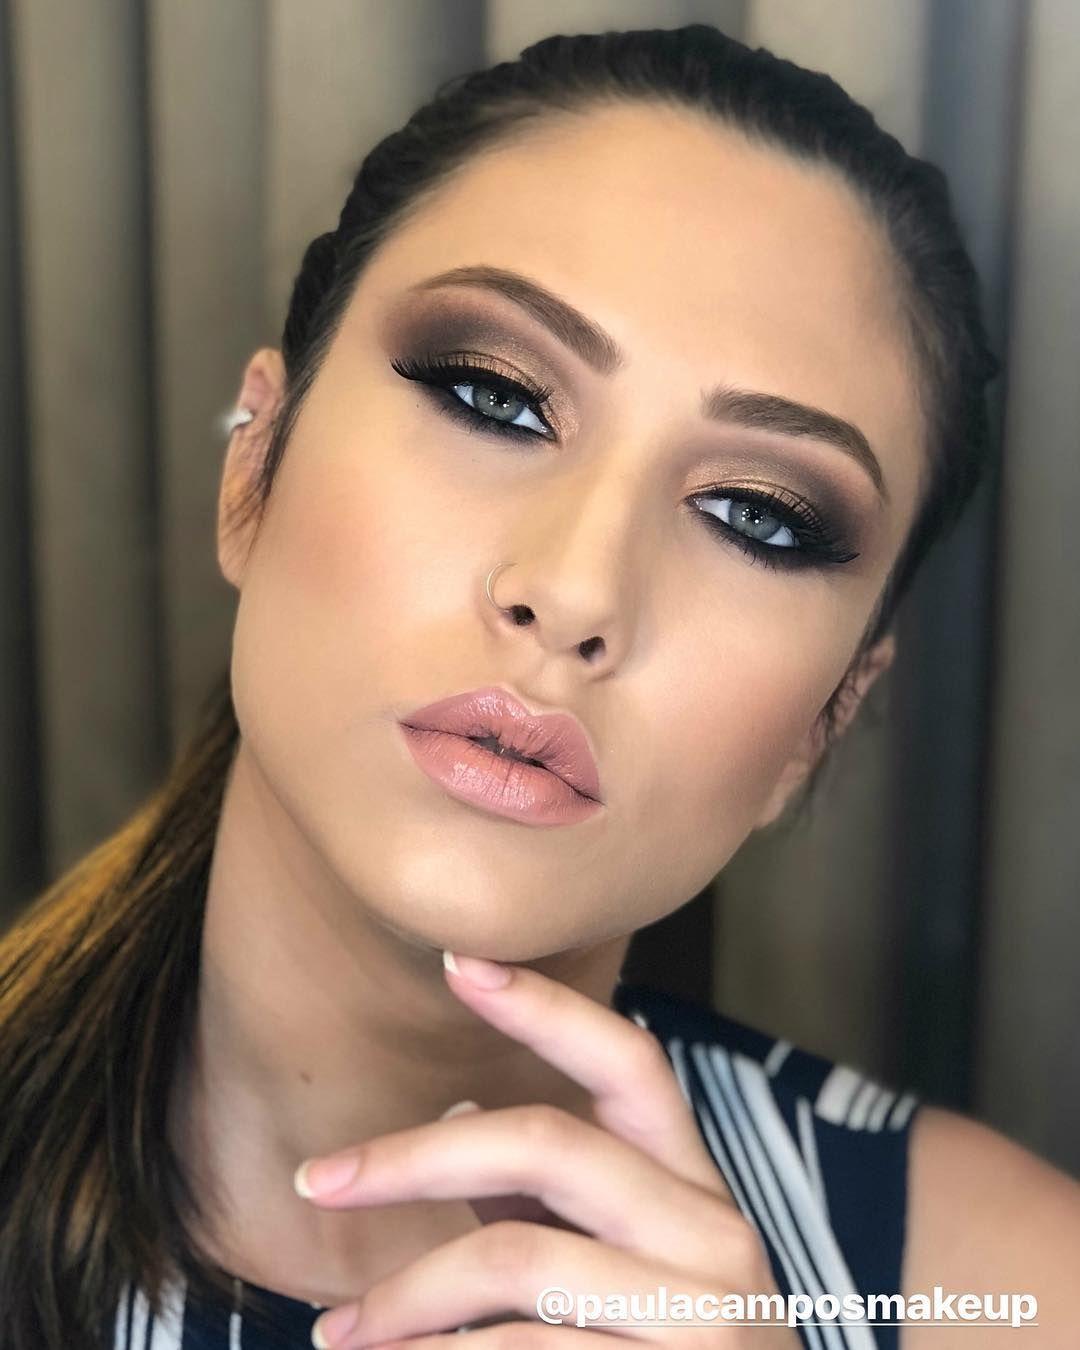 "965 curtidas, 19 comentários - Camila Campos (@camilacamposmakeup) no Instagram: ""Que make! @paulacamposmakeup arrasou meu amor. #studiocamilacampos #makeporpaulacamposmakeup"""